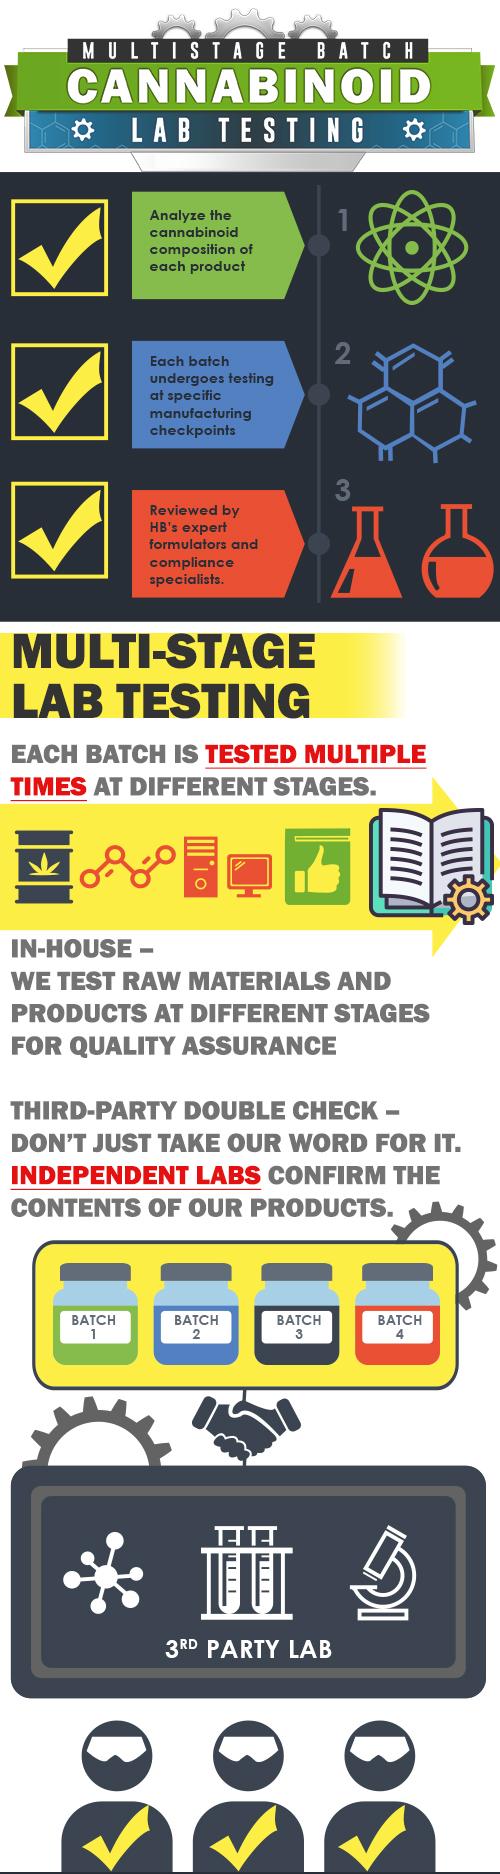 Infographic Explaining CBD Lab Testing